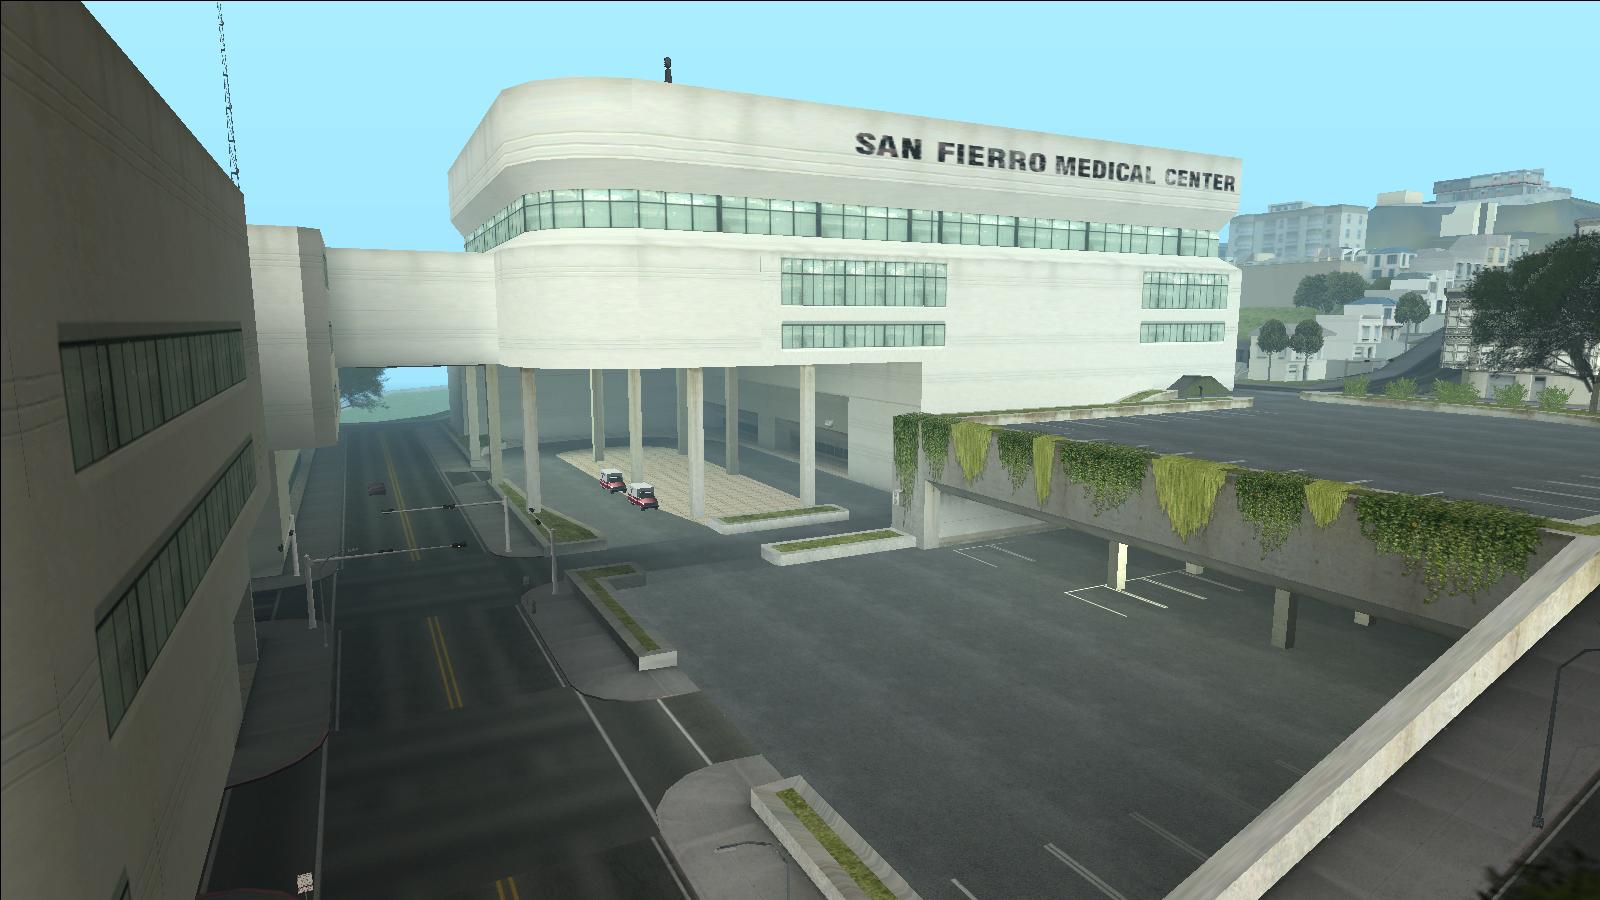 San Fierro Medical Center